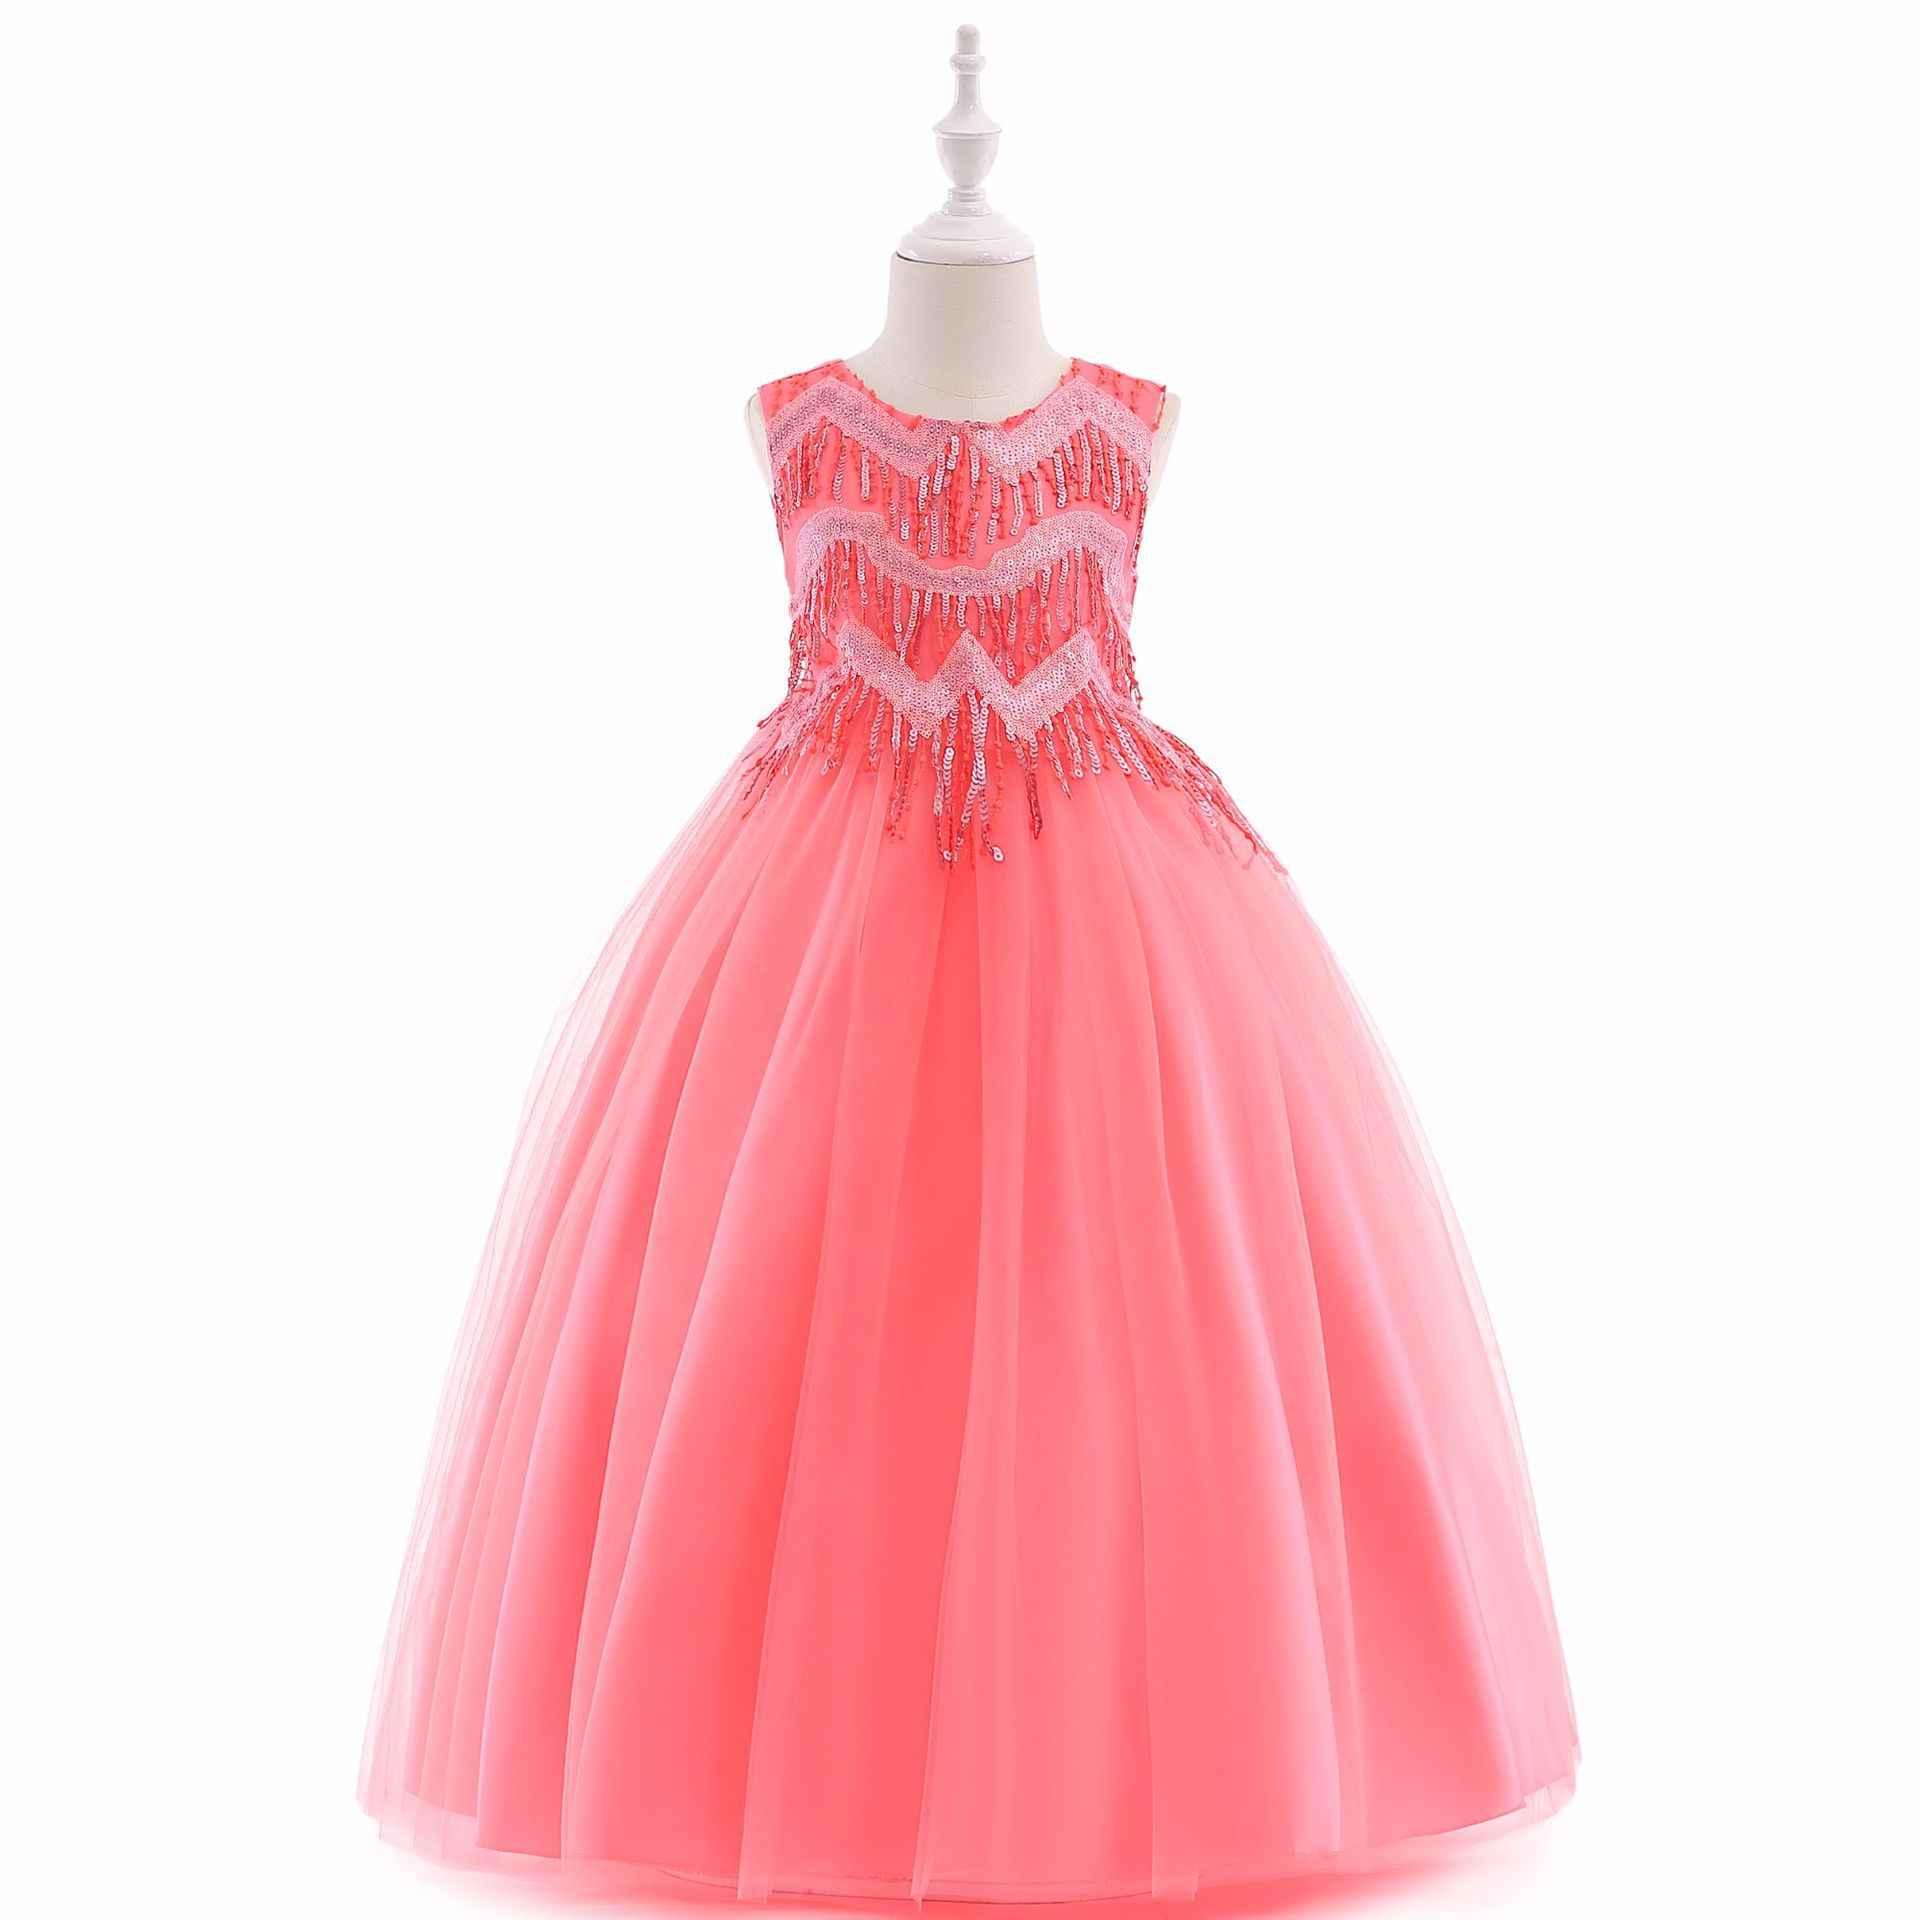 4031cb76f Toddler Party Dresses Amazon - raveitsafe